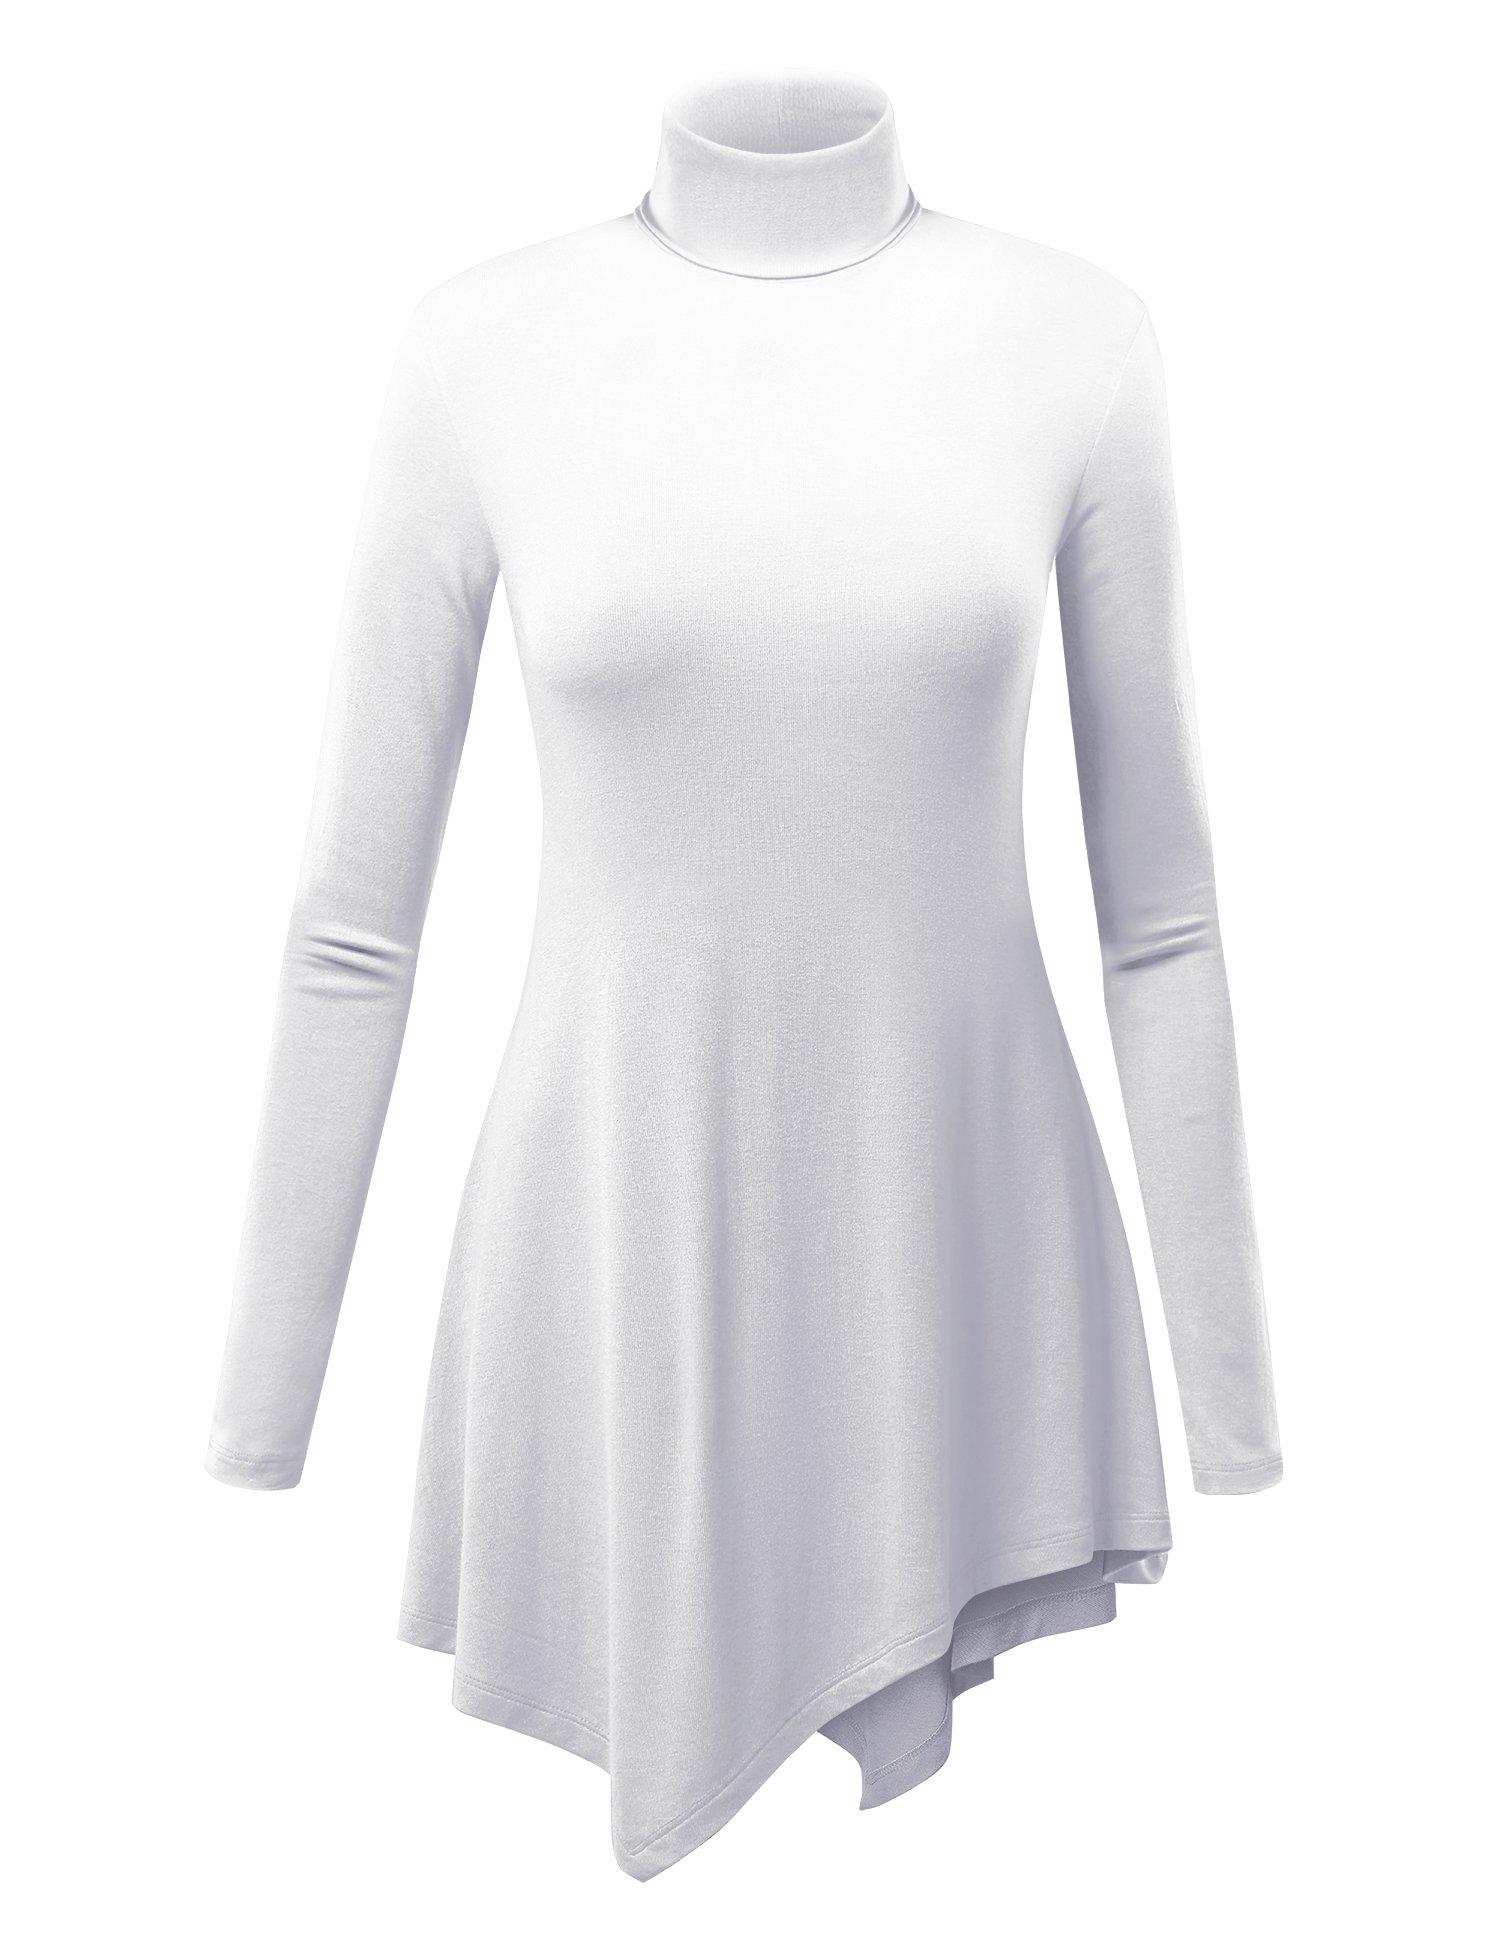 WT993 Womens Turtle Neck Long Sleeve Top With Handkerchief Hem XXL White